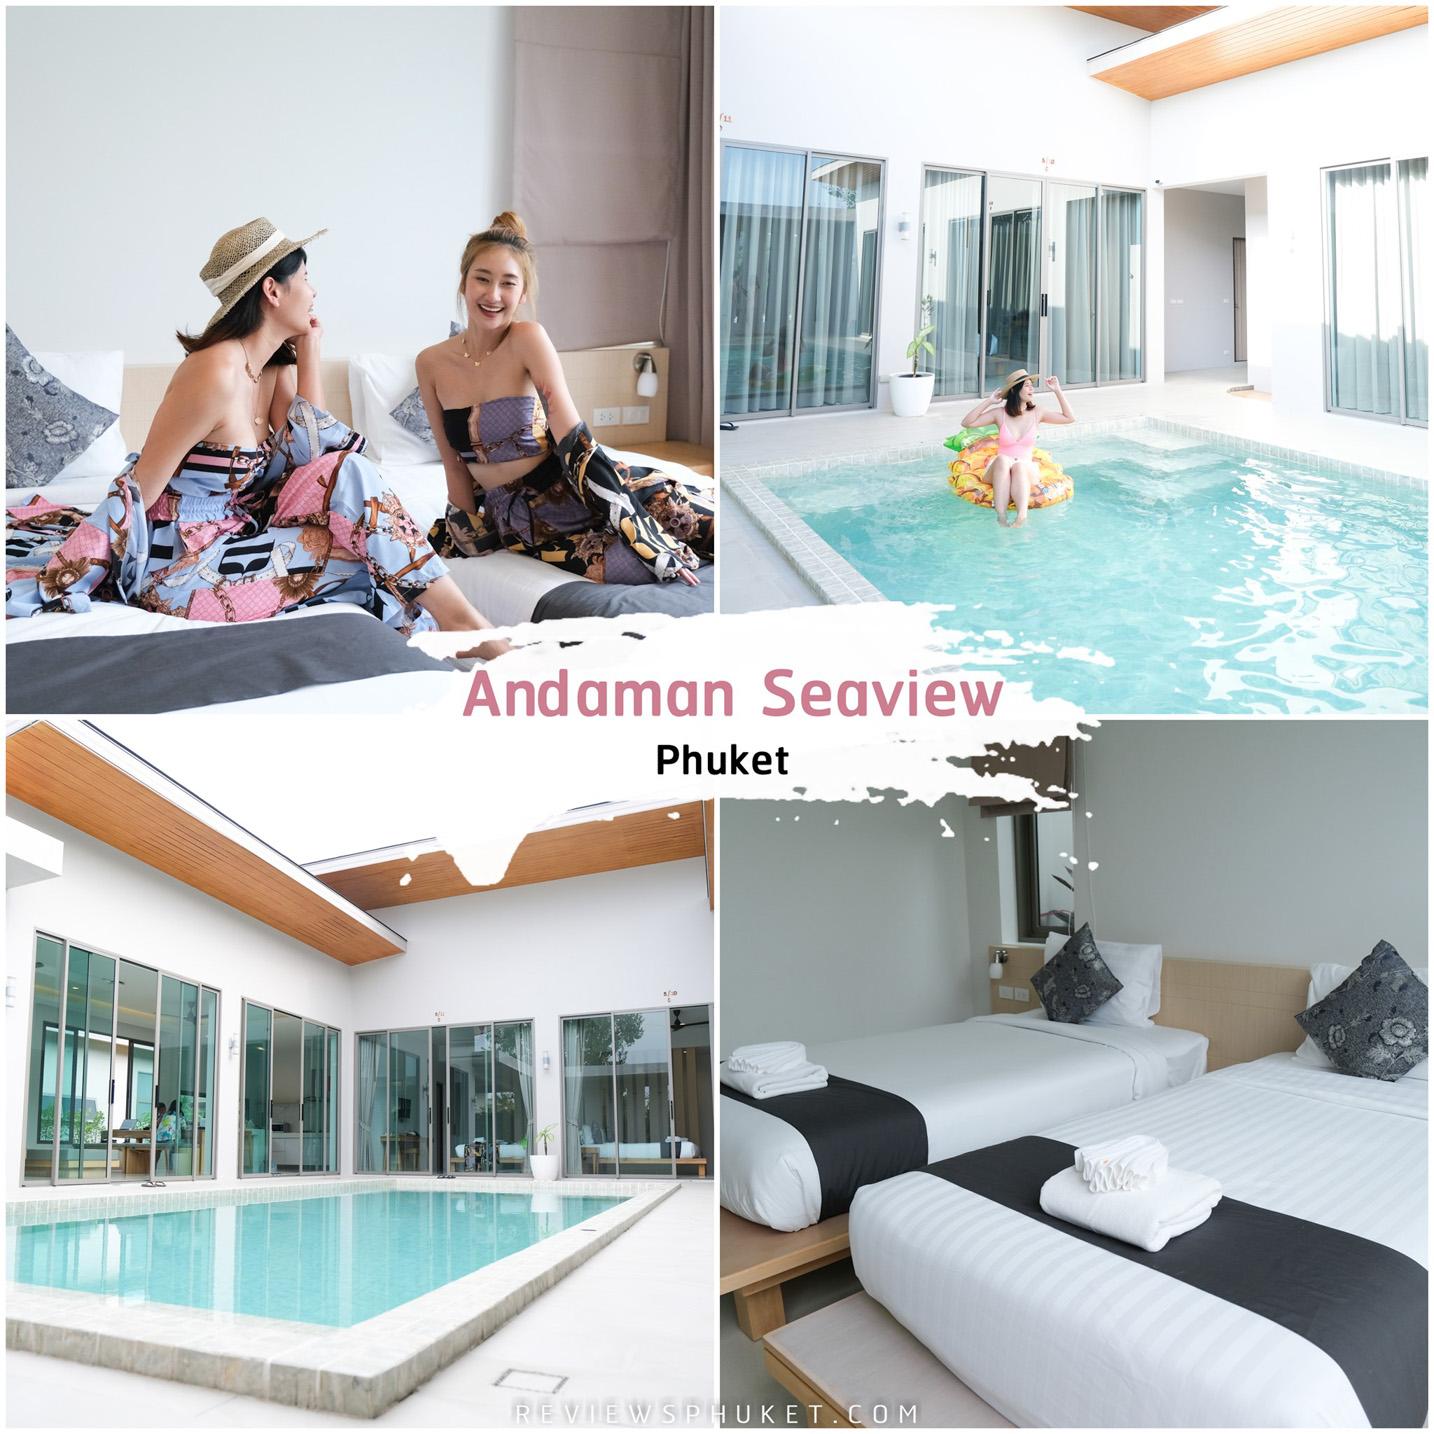 Andaman Seaview Phuket ที่พักภูเก็ตสุดสวย วิลล่าเด็ด